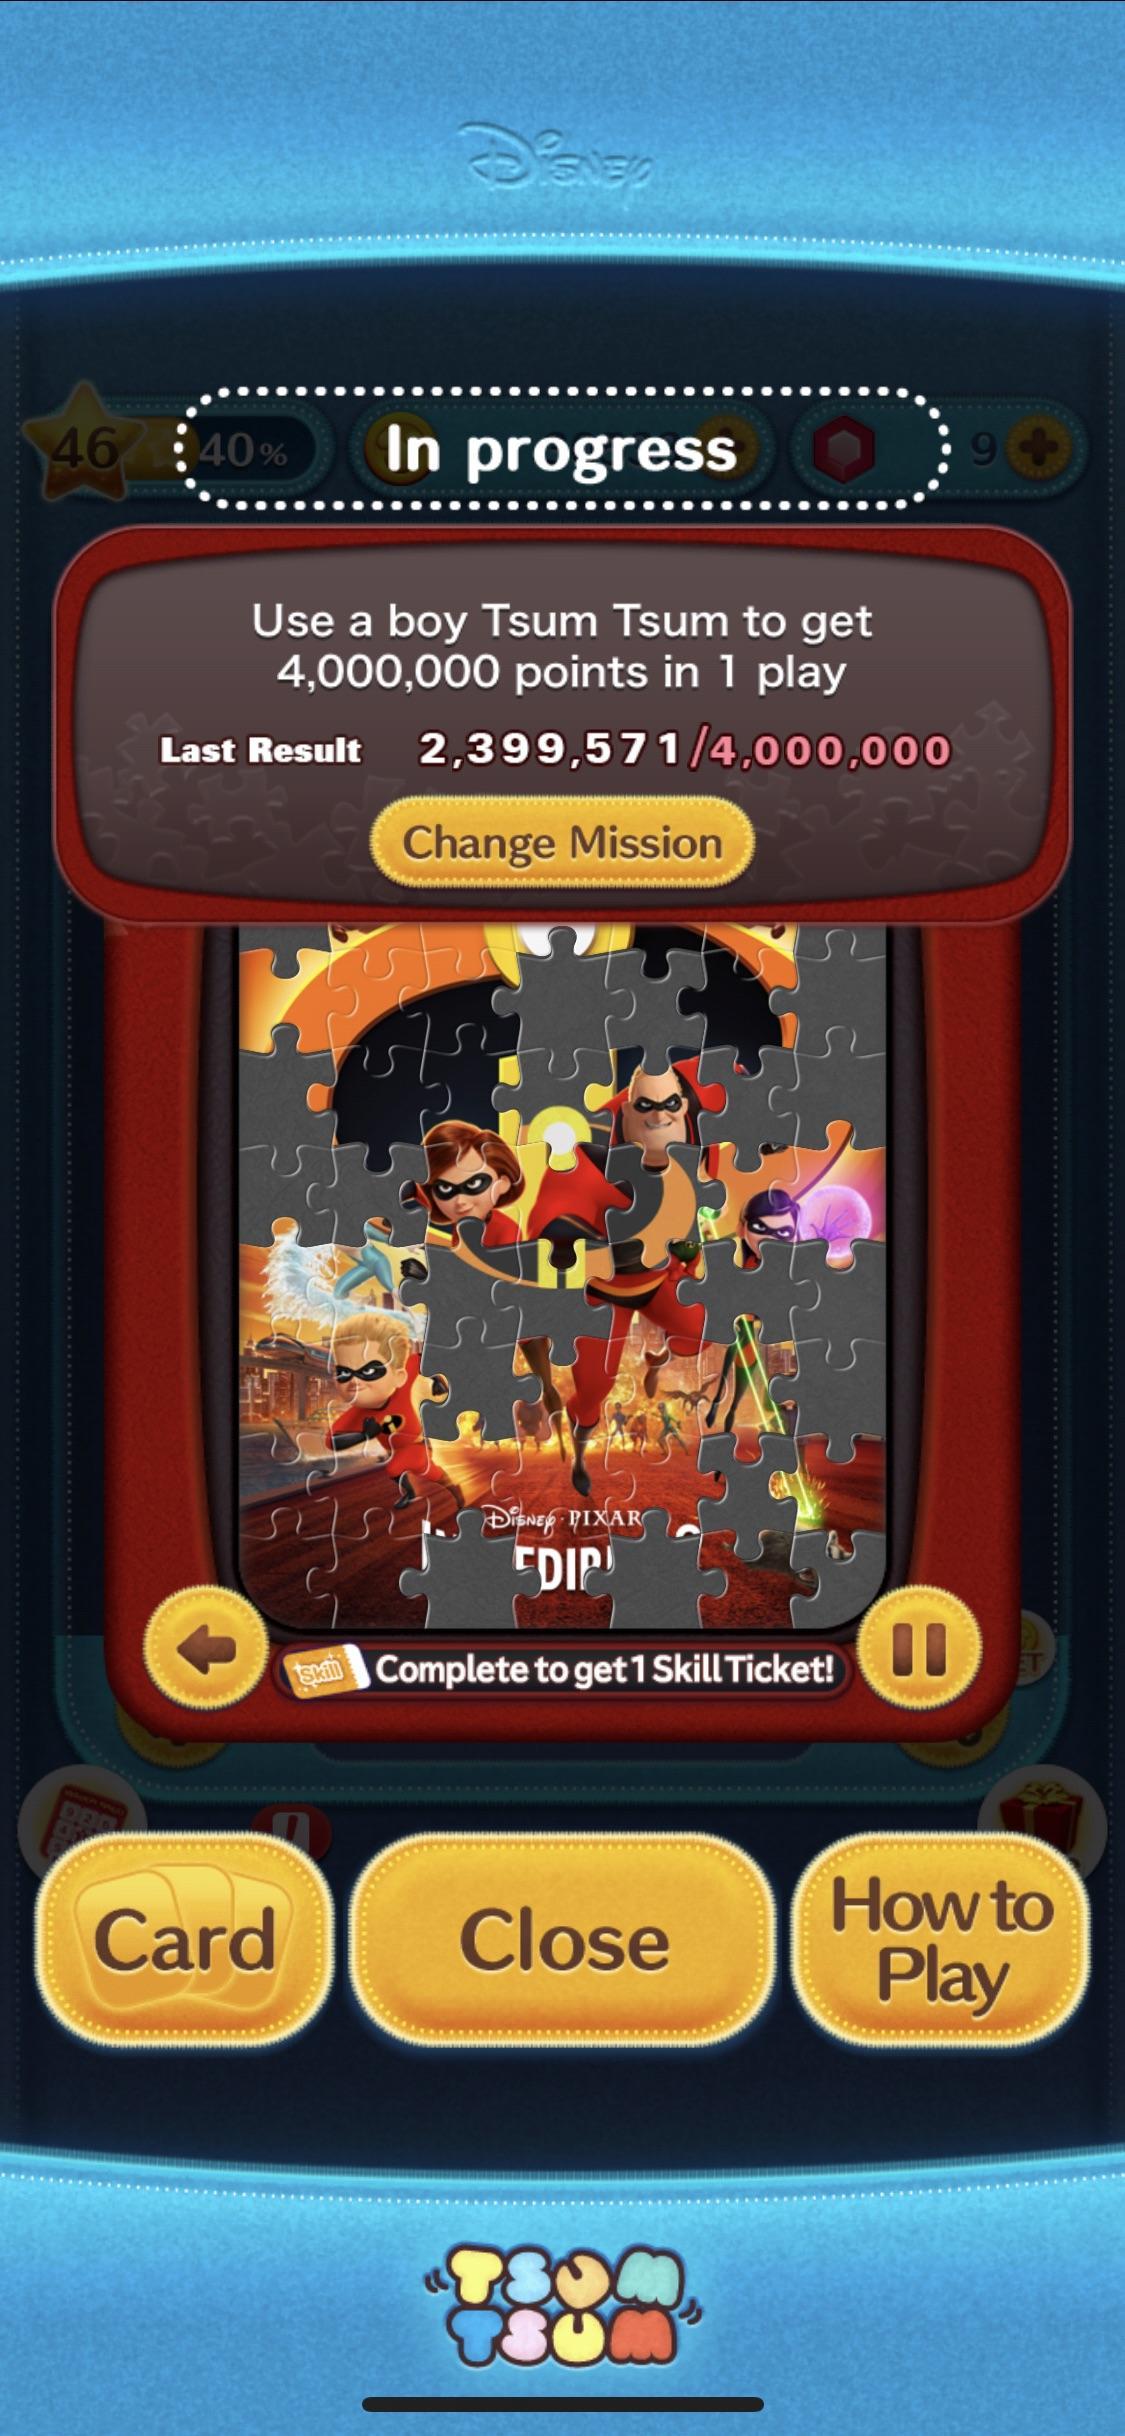 Best Tsum Tsum For Score : score, 4,000,000, Points, Threw, Life's, TsumTsum